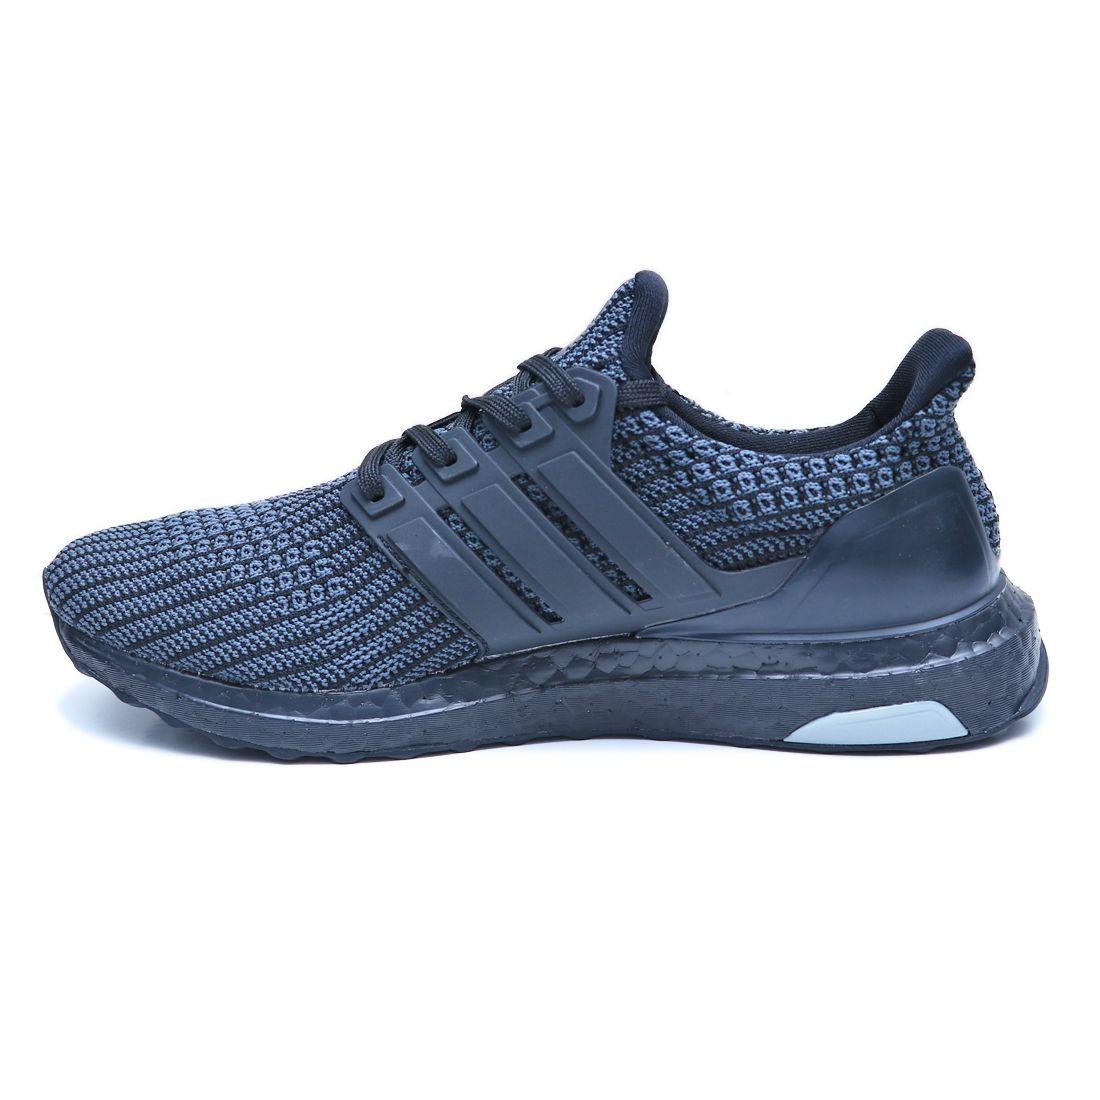 ace0bae8e7920b ... Adidas UltraBoost 4.0 Low Black Running Shoes ...